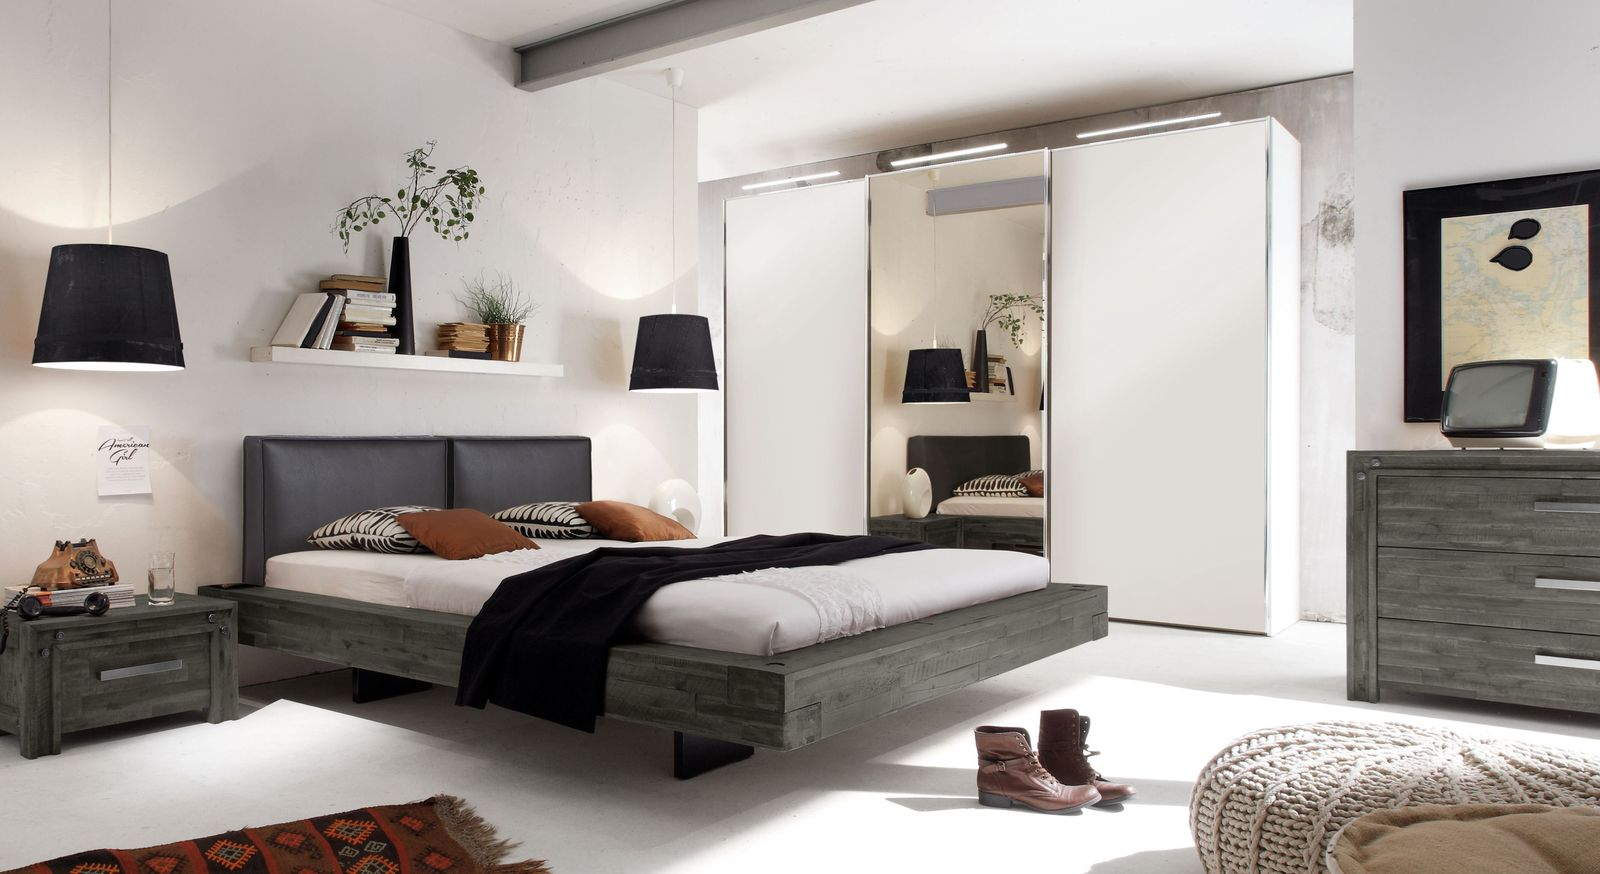 Full Size of Schlafzimmer Komplett Guenstig Komplette Design Gnstig Kaufen Bettende Weiss Massivholz Bett Schränke Wohnzimmer Kronleuchter Deckenleuchte Lampe Mit Schlafzimmer Schlafzimmer Komplett Guenstig